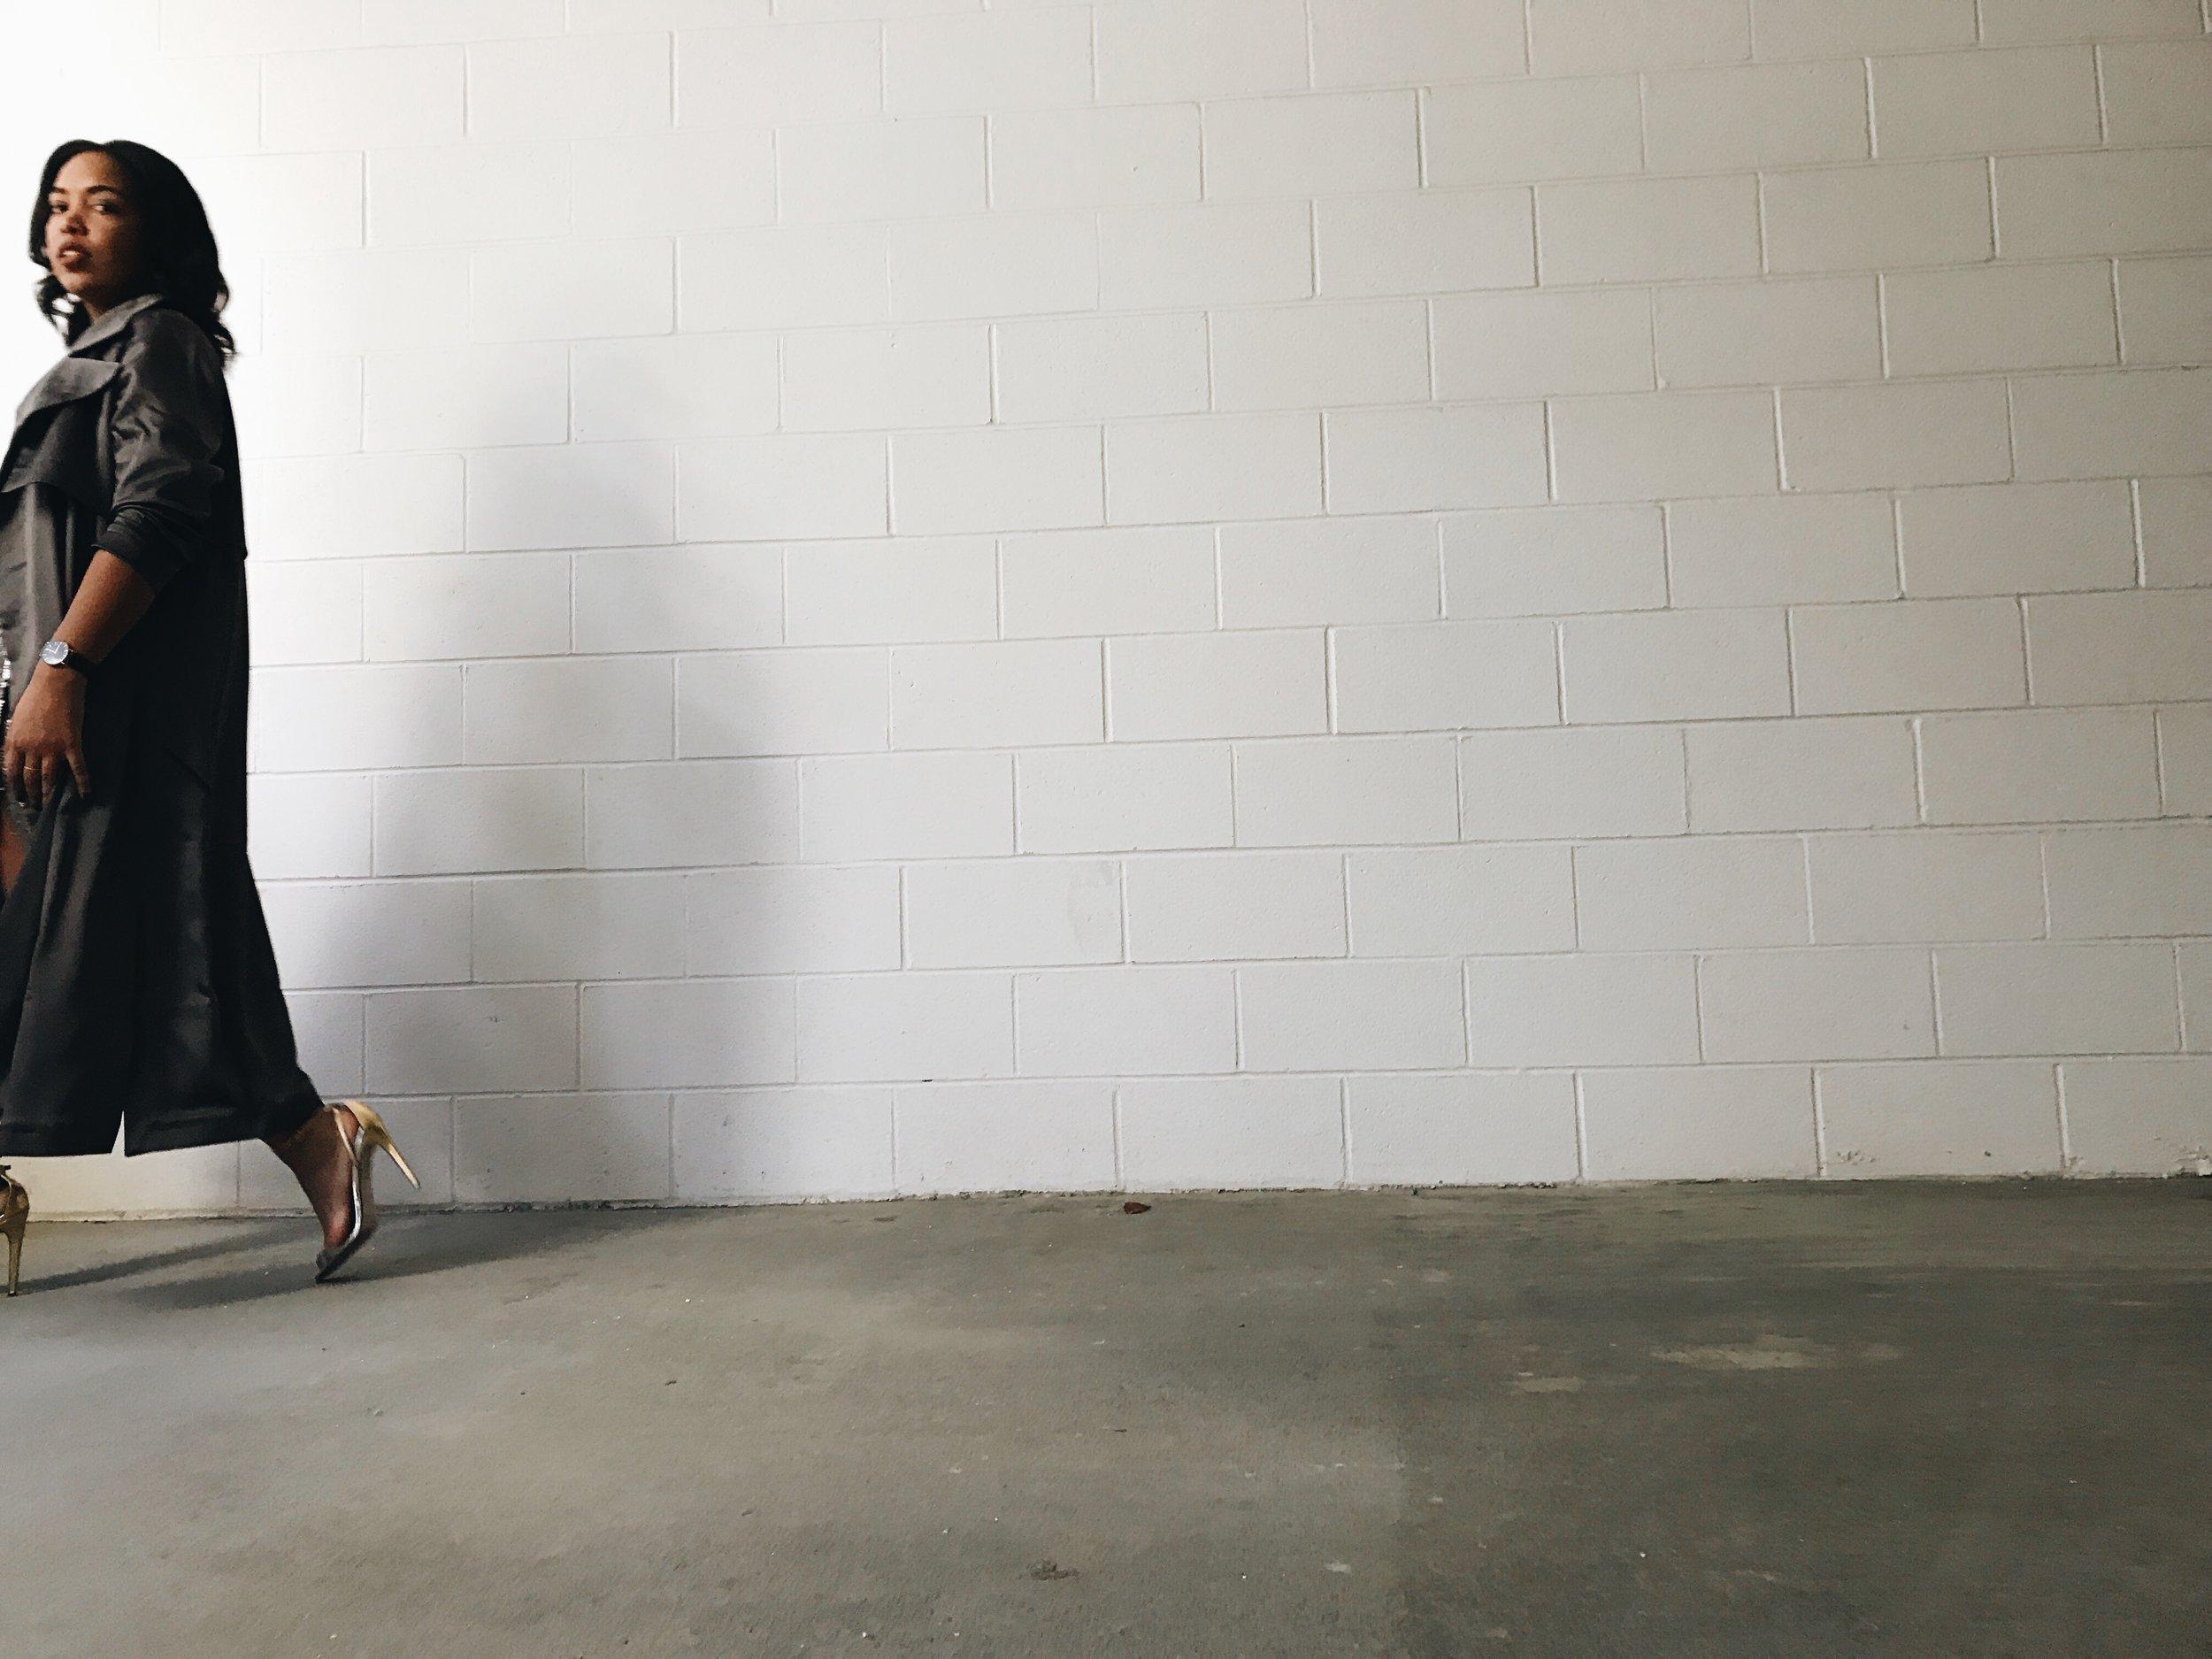 3-Lavish-Alice-Sequin-Dress-ASOS-Satin-Trench-Coat-Metallic-Heels-NYE-outfit.jpg